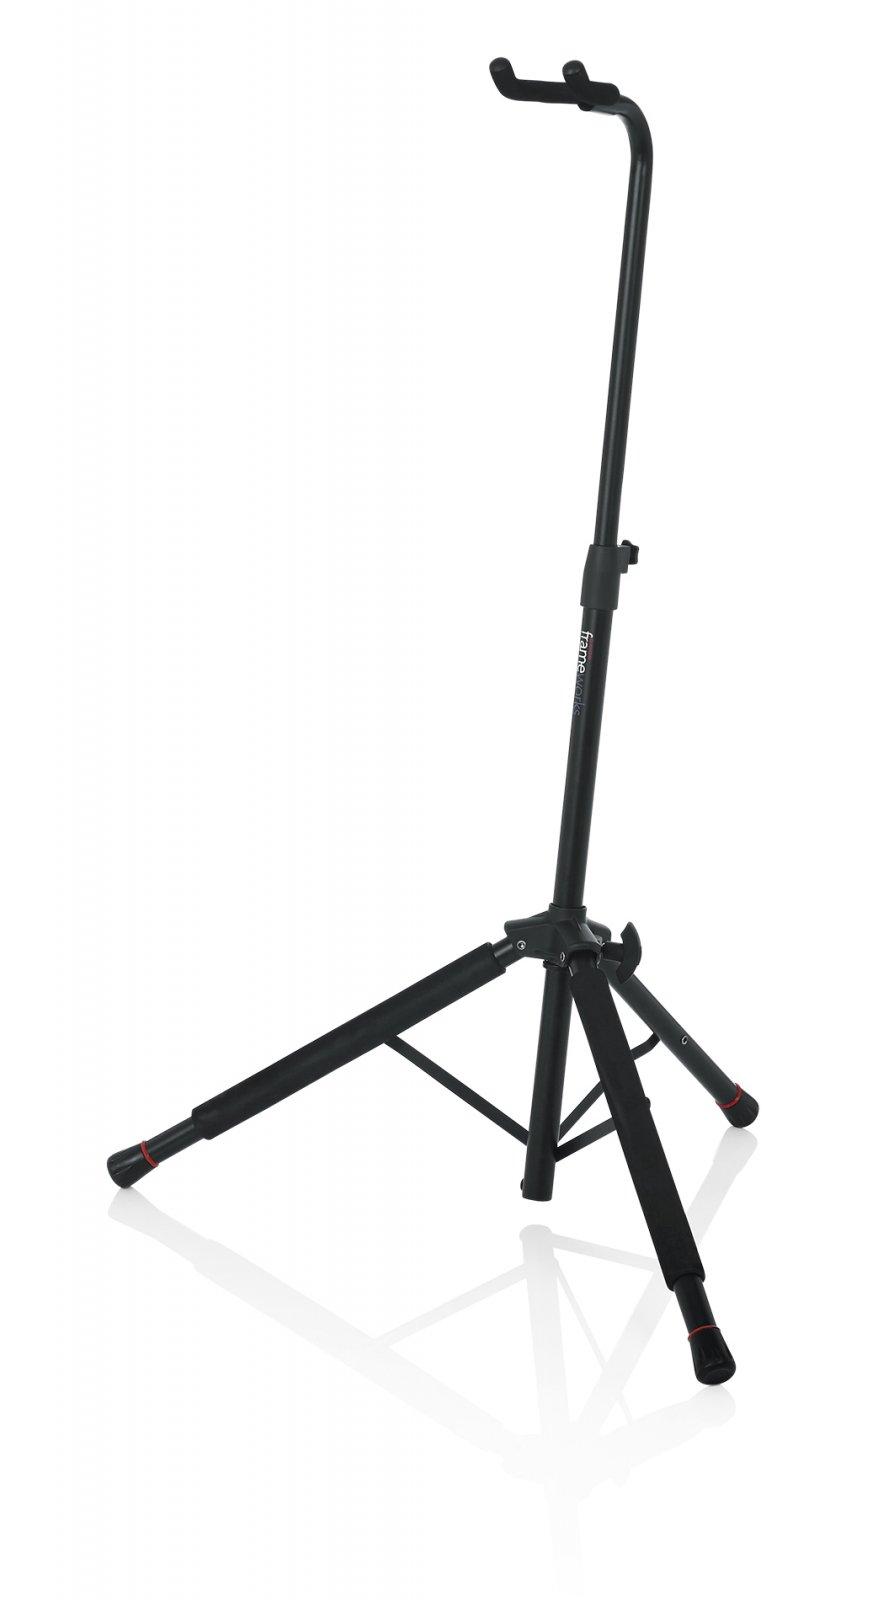 Gator GFWGTR1200 - Single Guitar Stand, Hanging